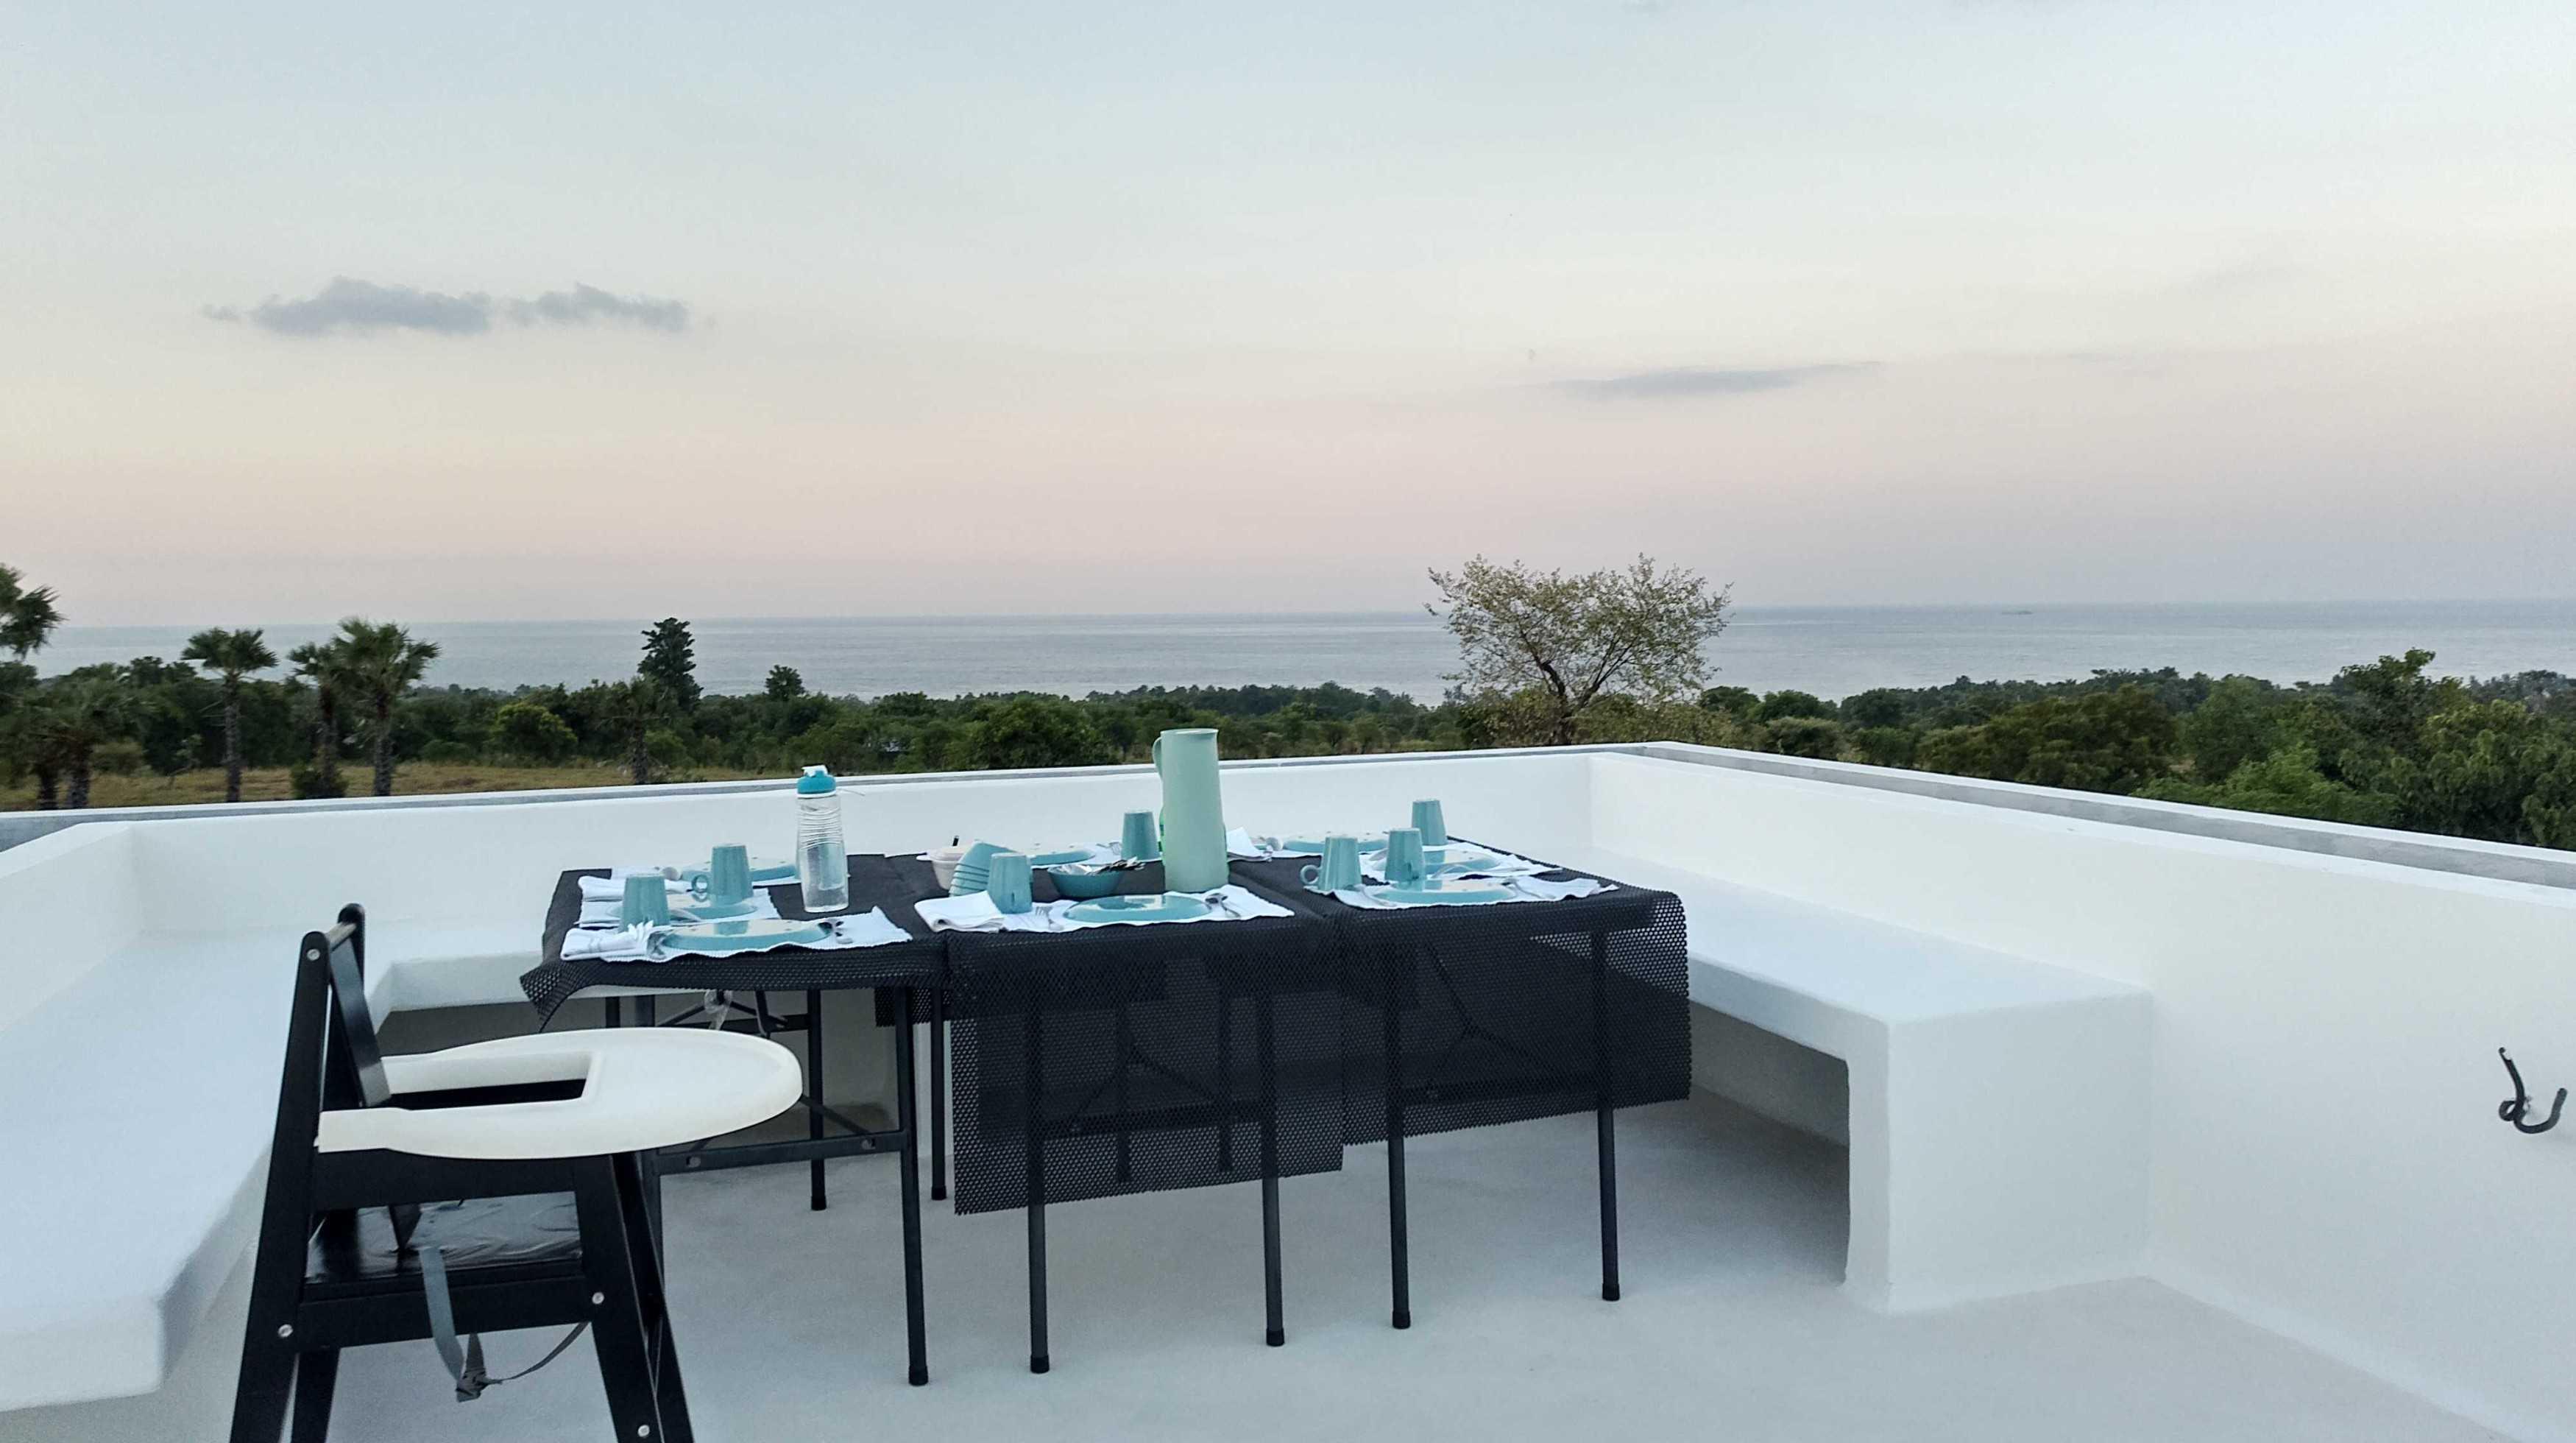 Nuansa Studio Architect Villa Resort Tulamben Bali, Indonesia Bali, Indonesia Nuansa-Studio-Architect-Villa-Resort-Tulamben   56521